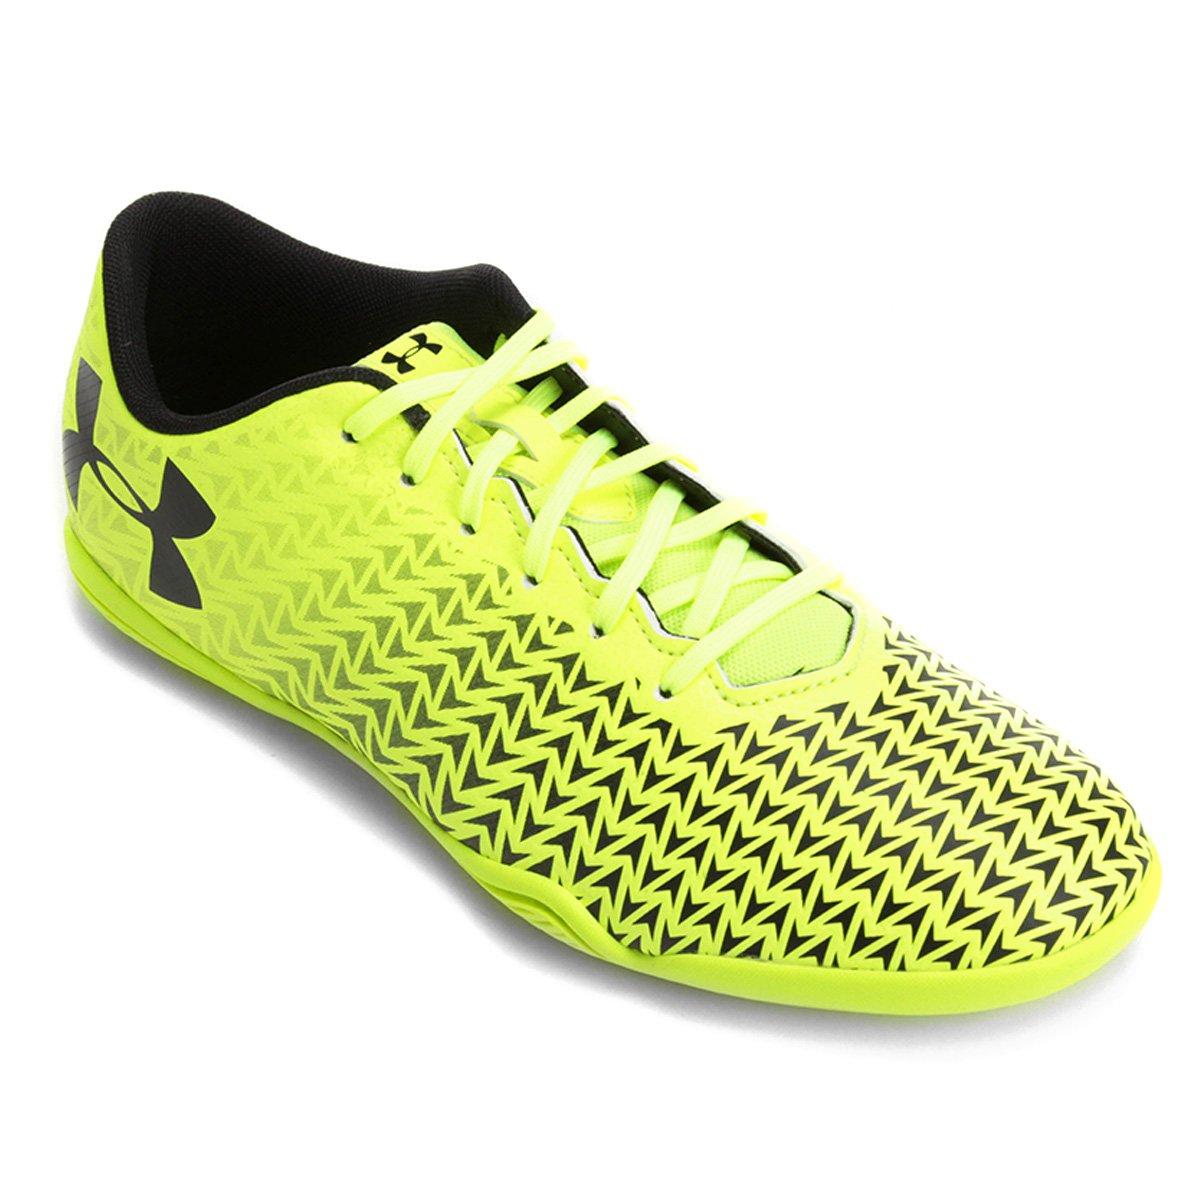 22177111efd Chuteira Futsal Under Armour CF Force 3.0 IN